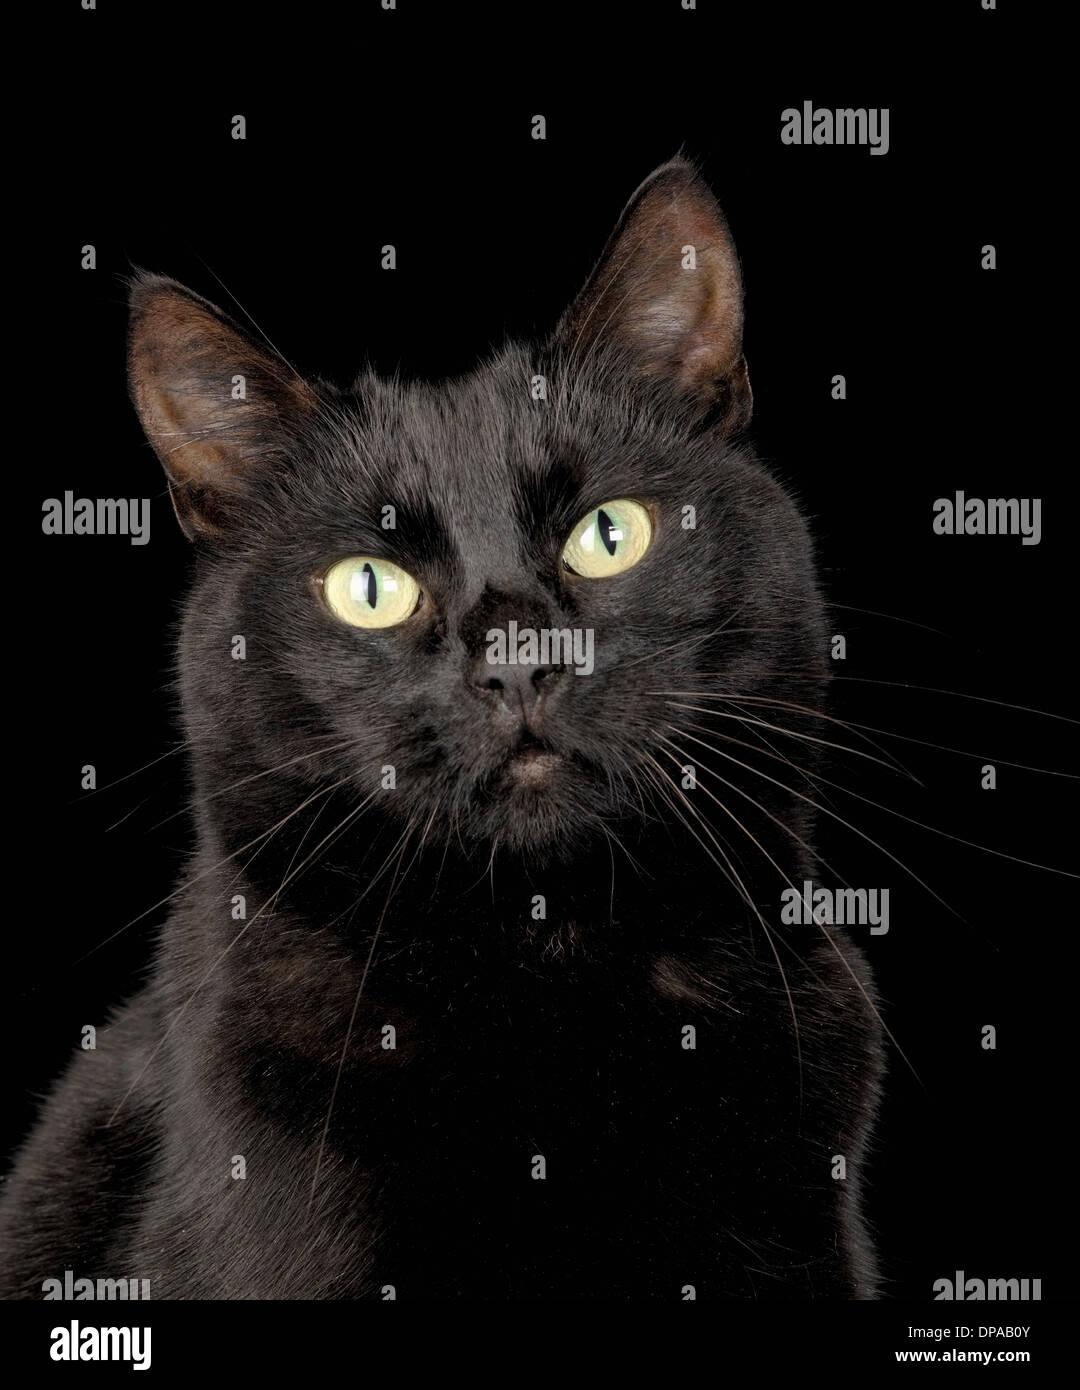 Black cat - Stock Image